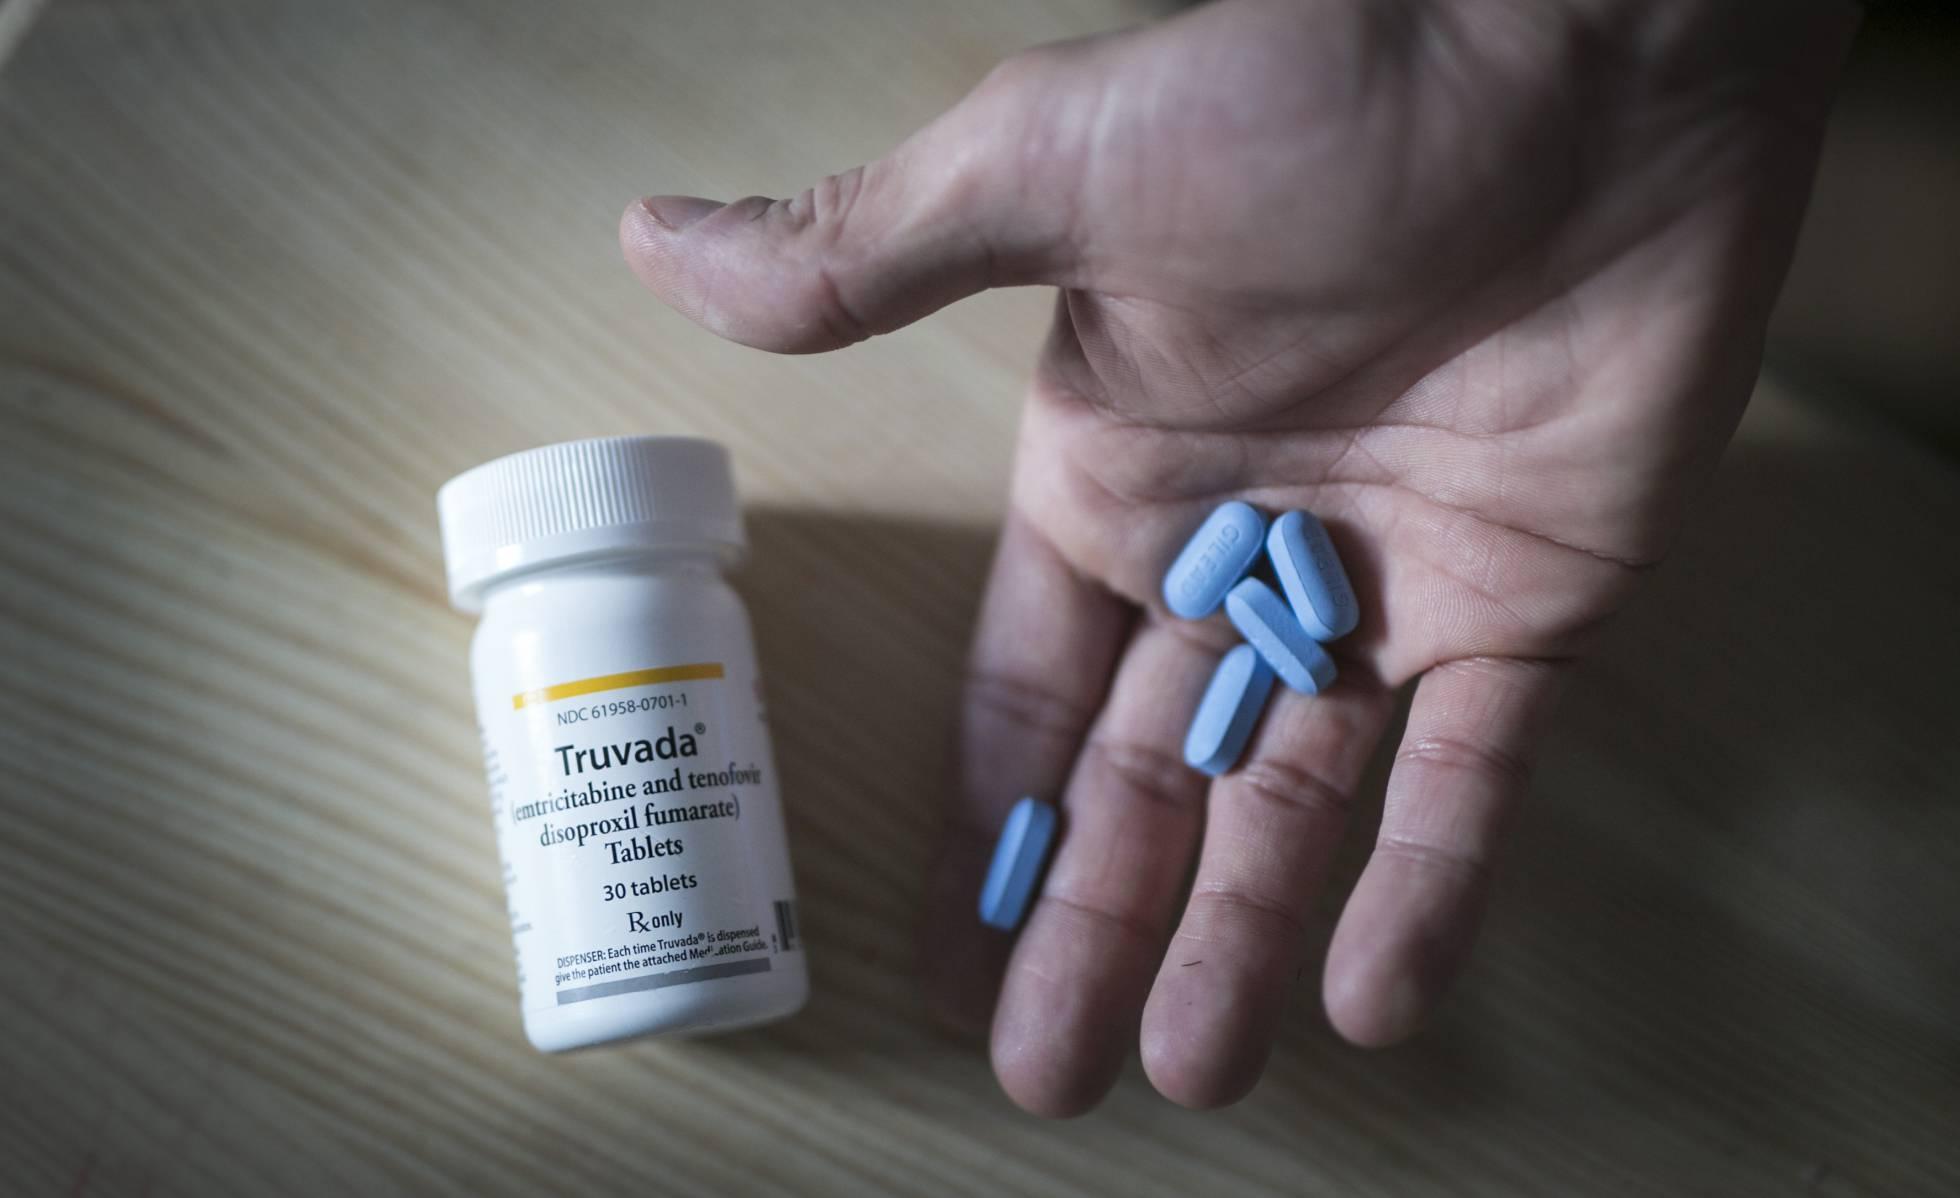 Cataluña ya prescribe la pastilla preventiva contra el VIH